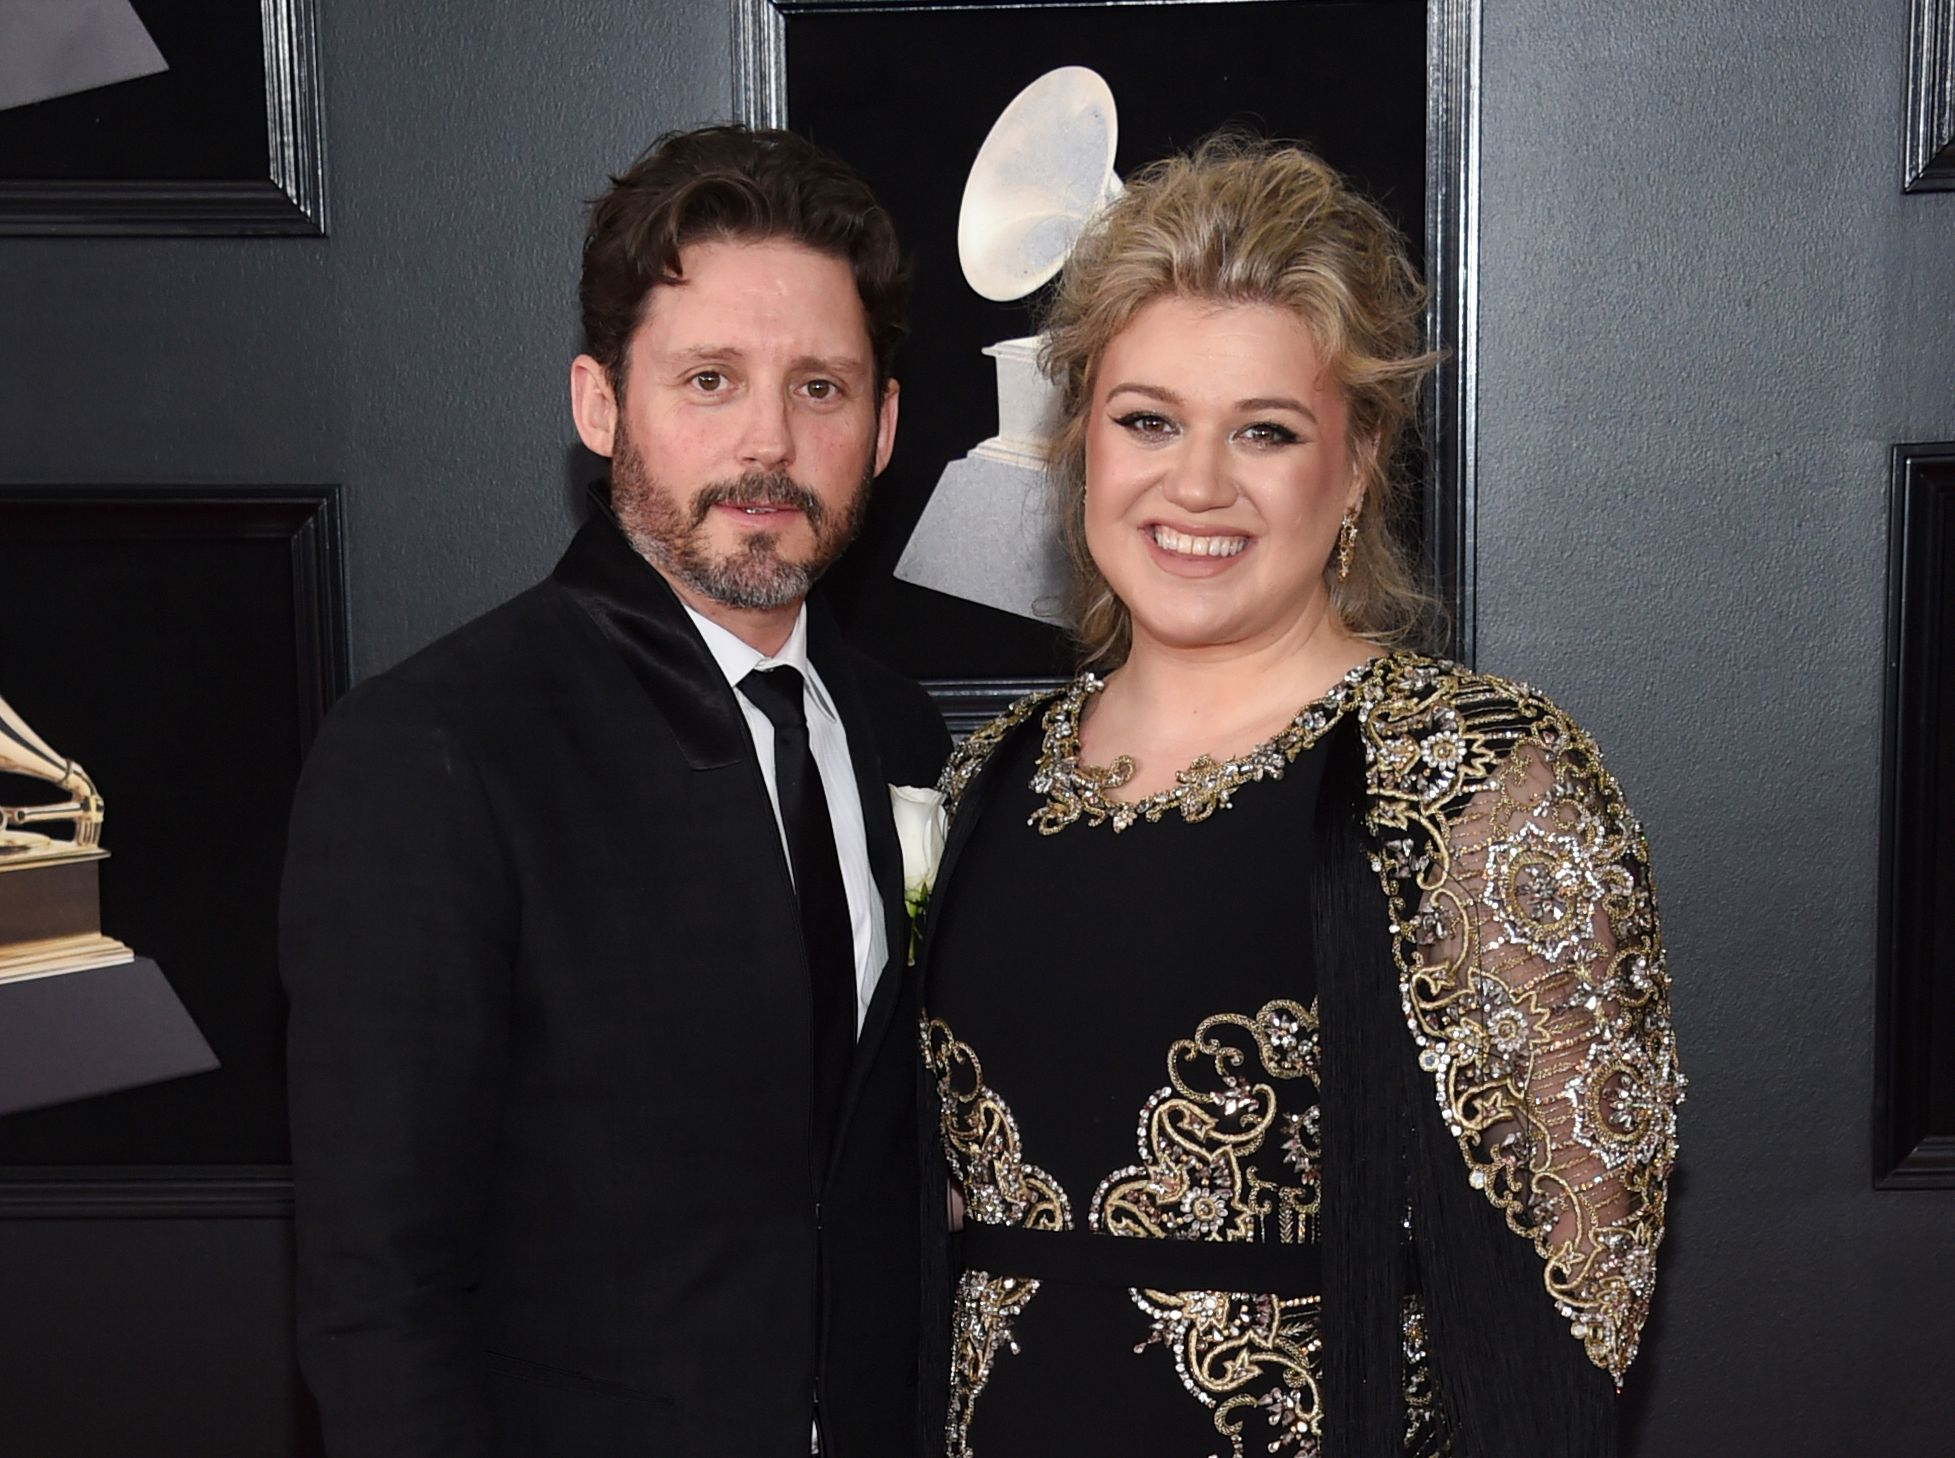 Kelly Clarkson and Brandon Blackstock Divorce: Singer Is 'Struggling'